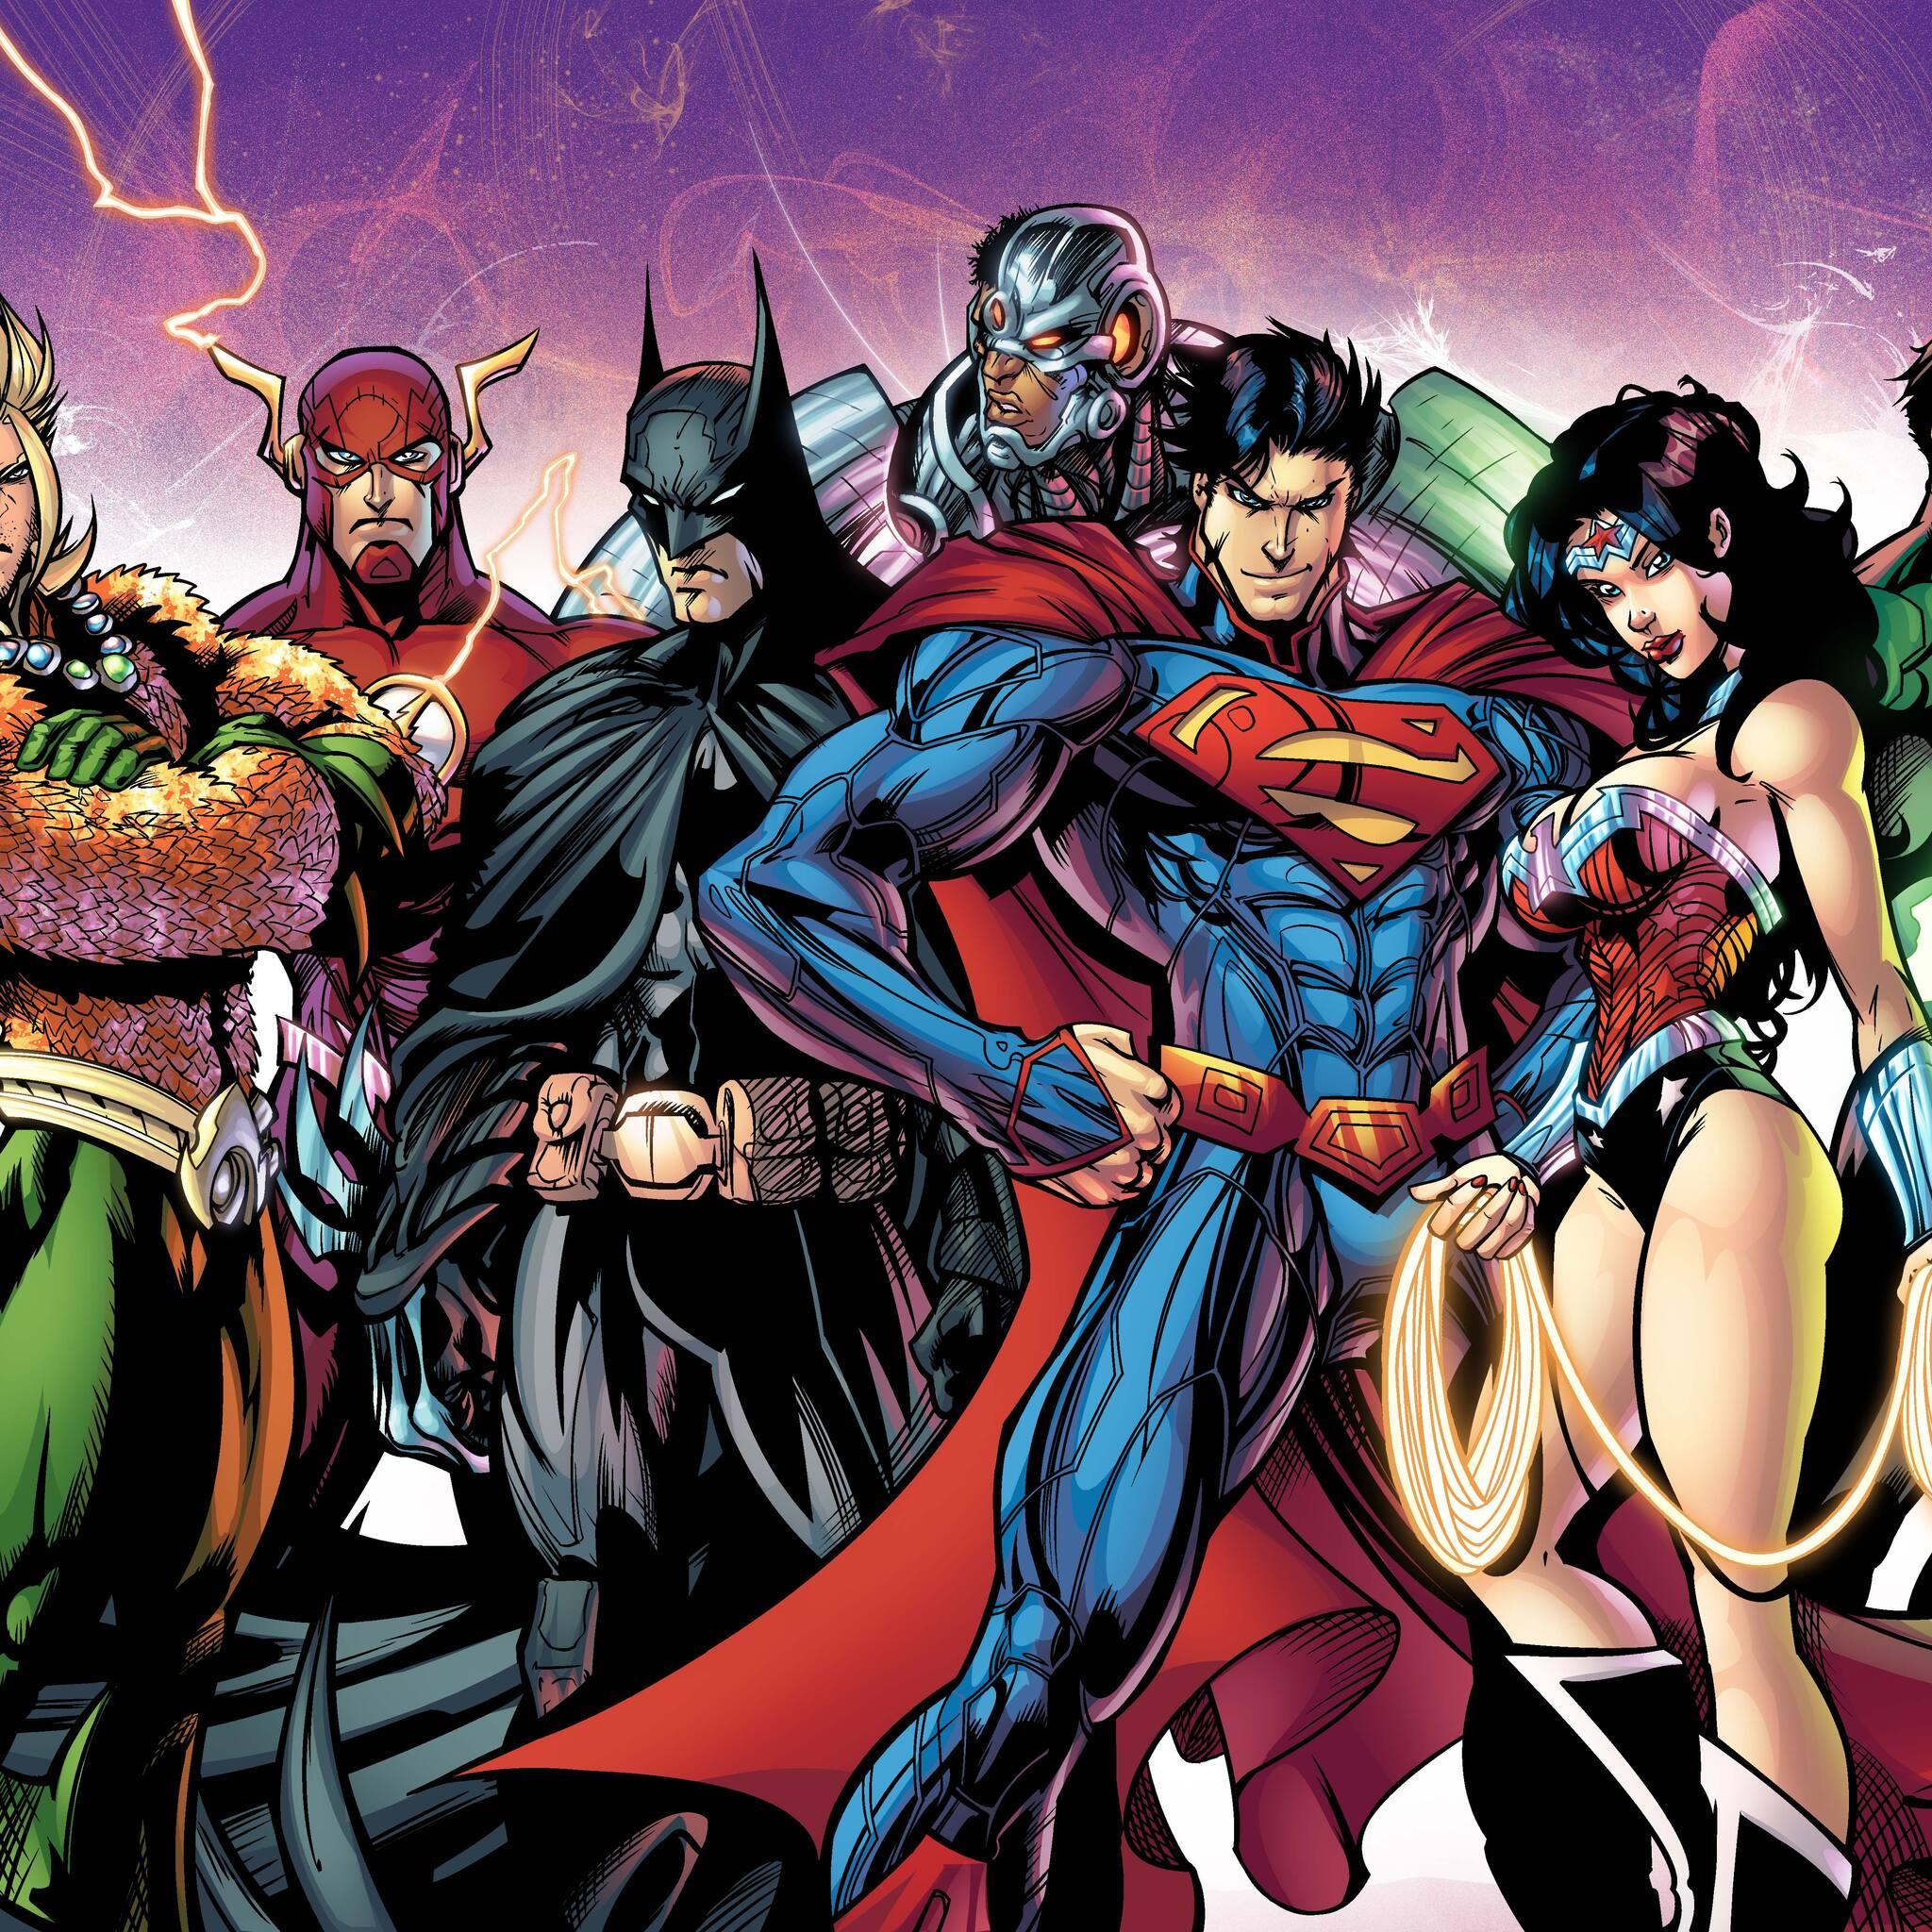 justice-league-artwork-5k-u3.jpg